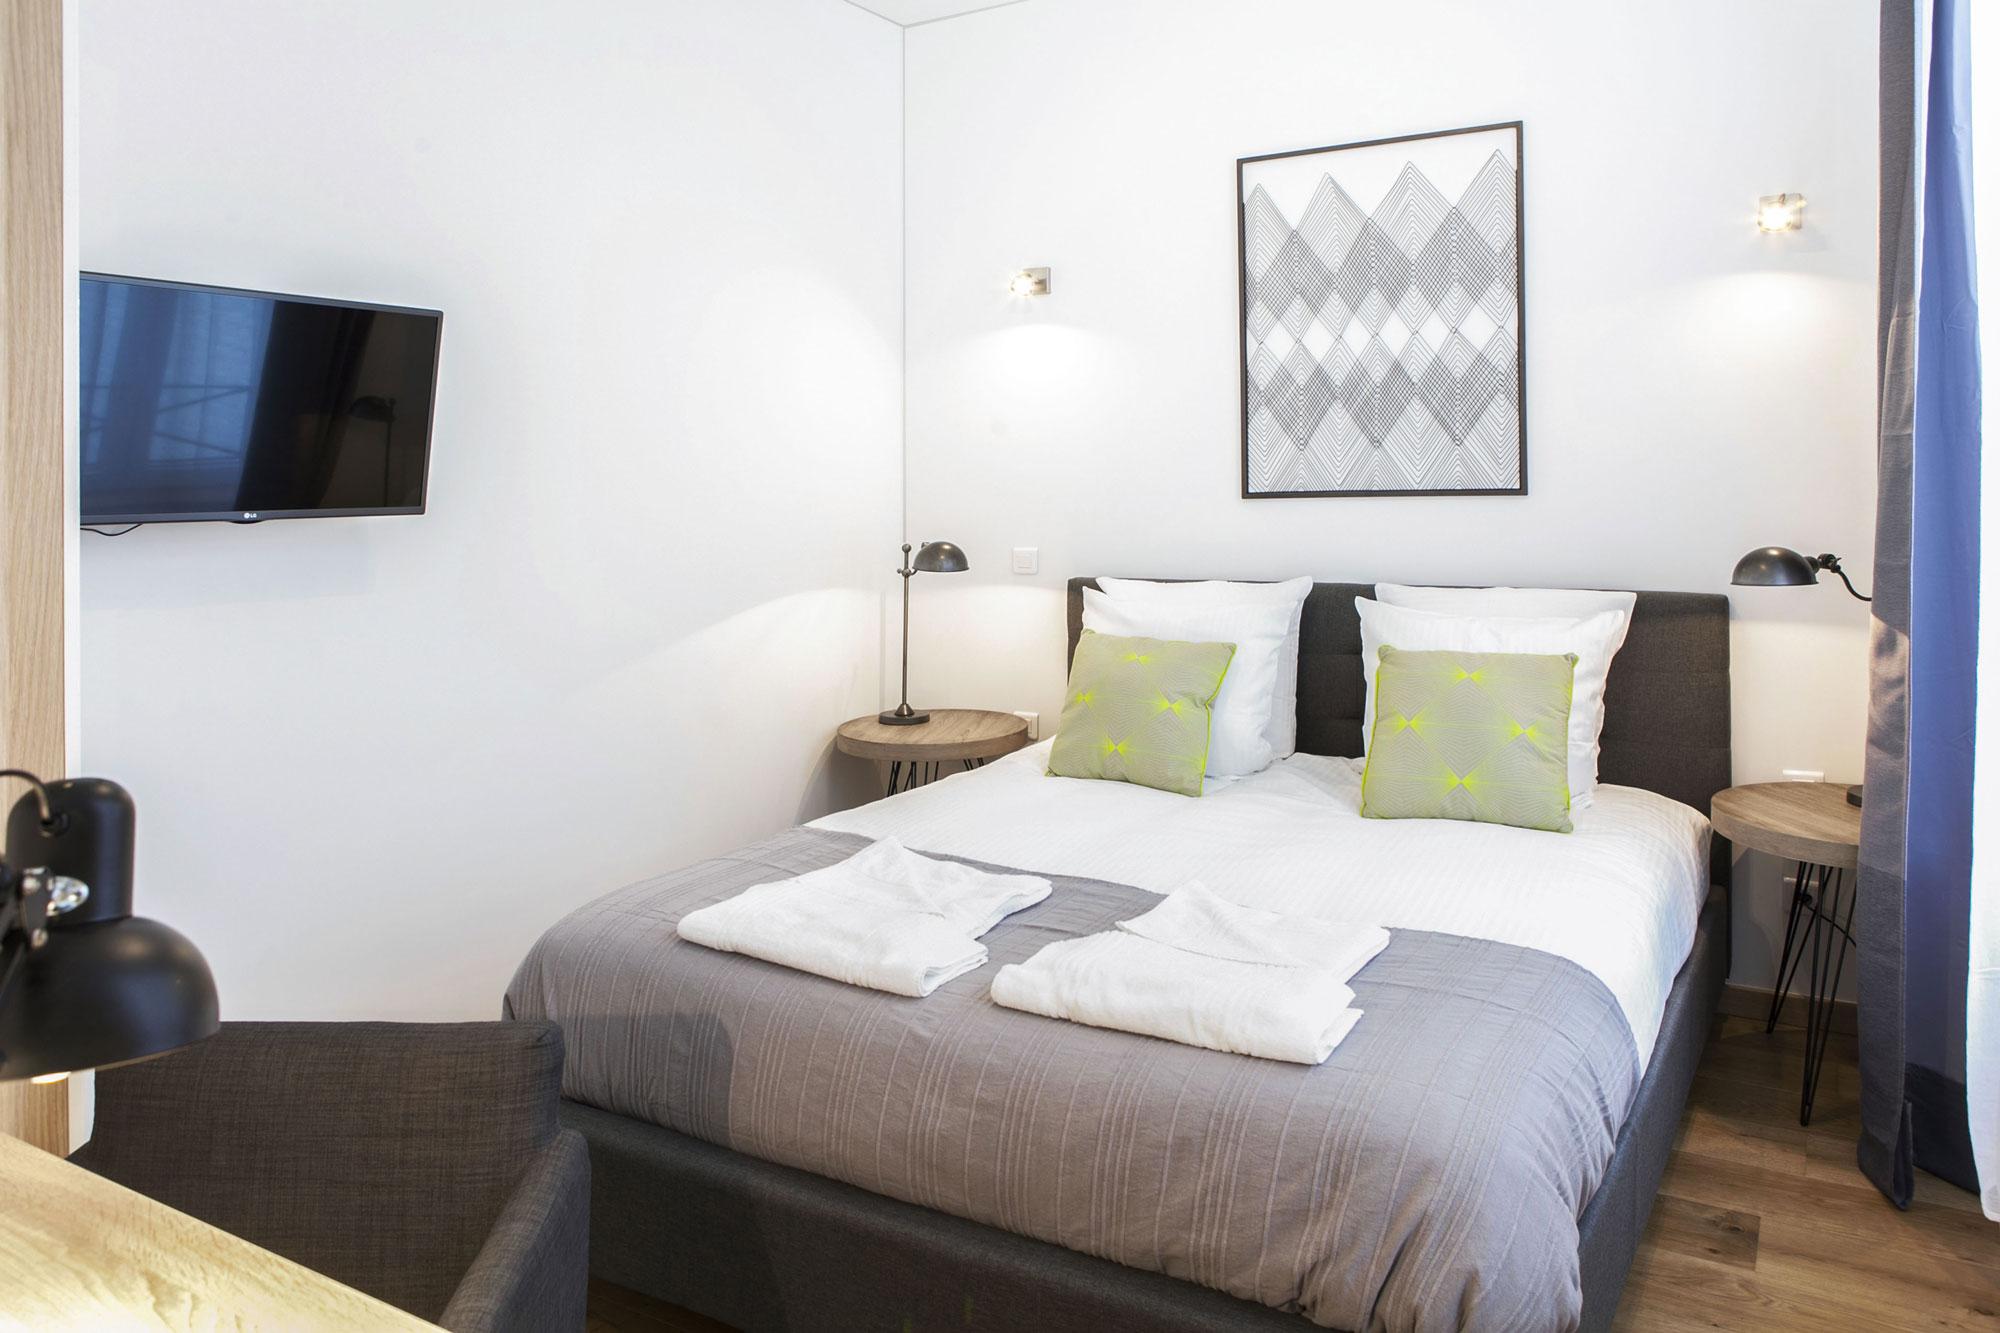 Le hilton flandres appart h tel lille for Location en appart hotel